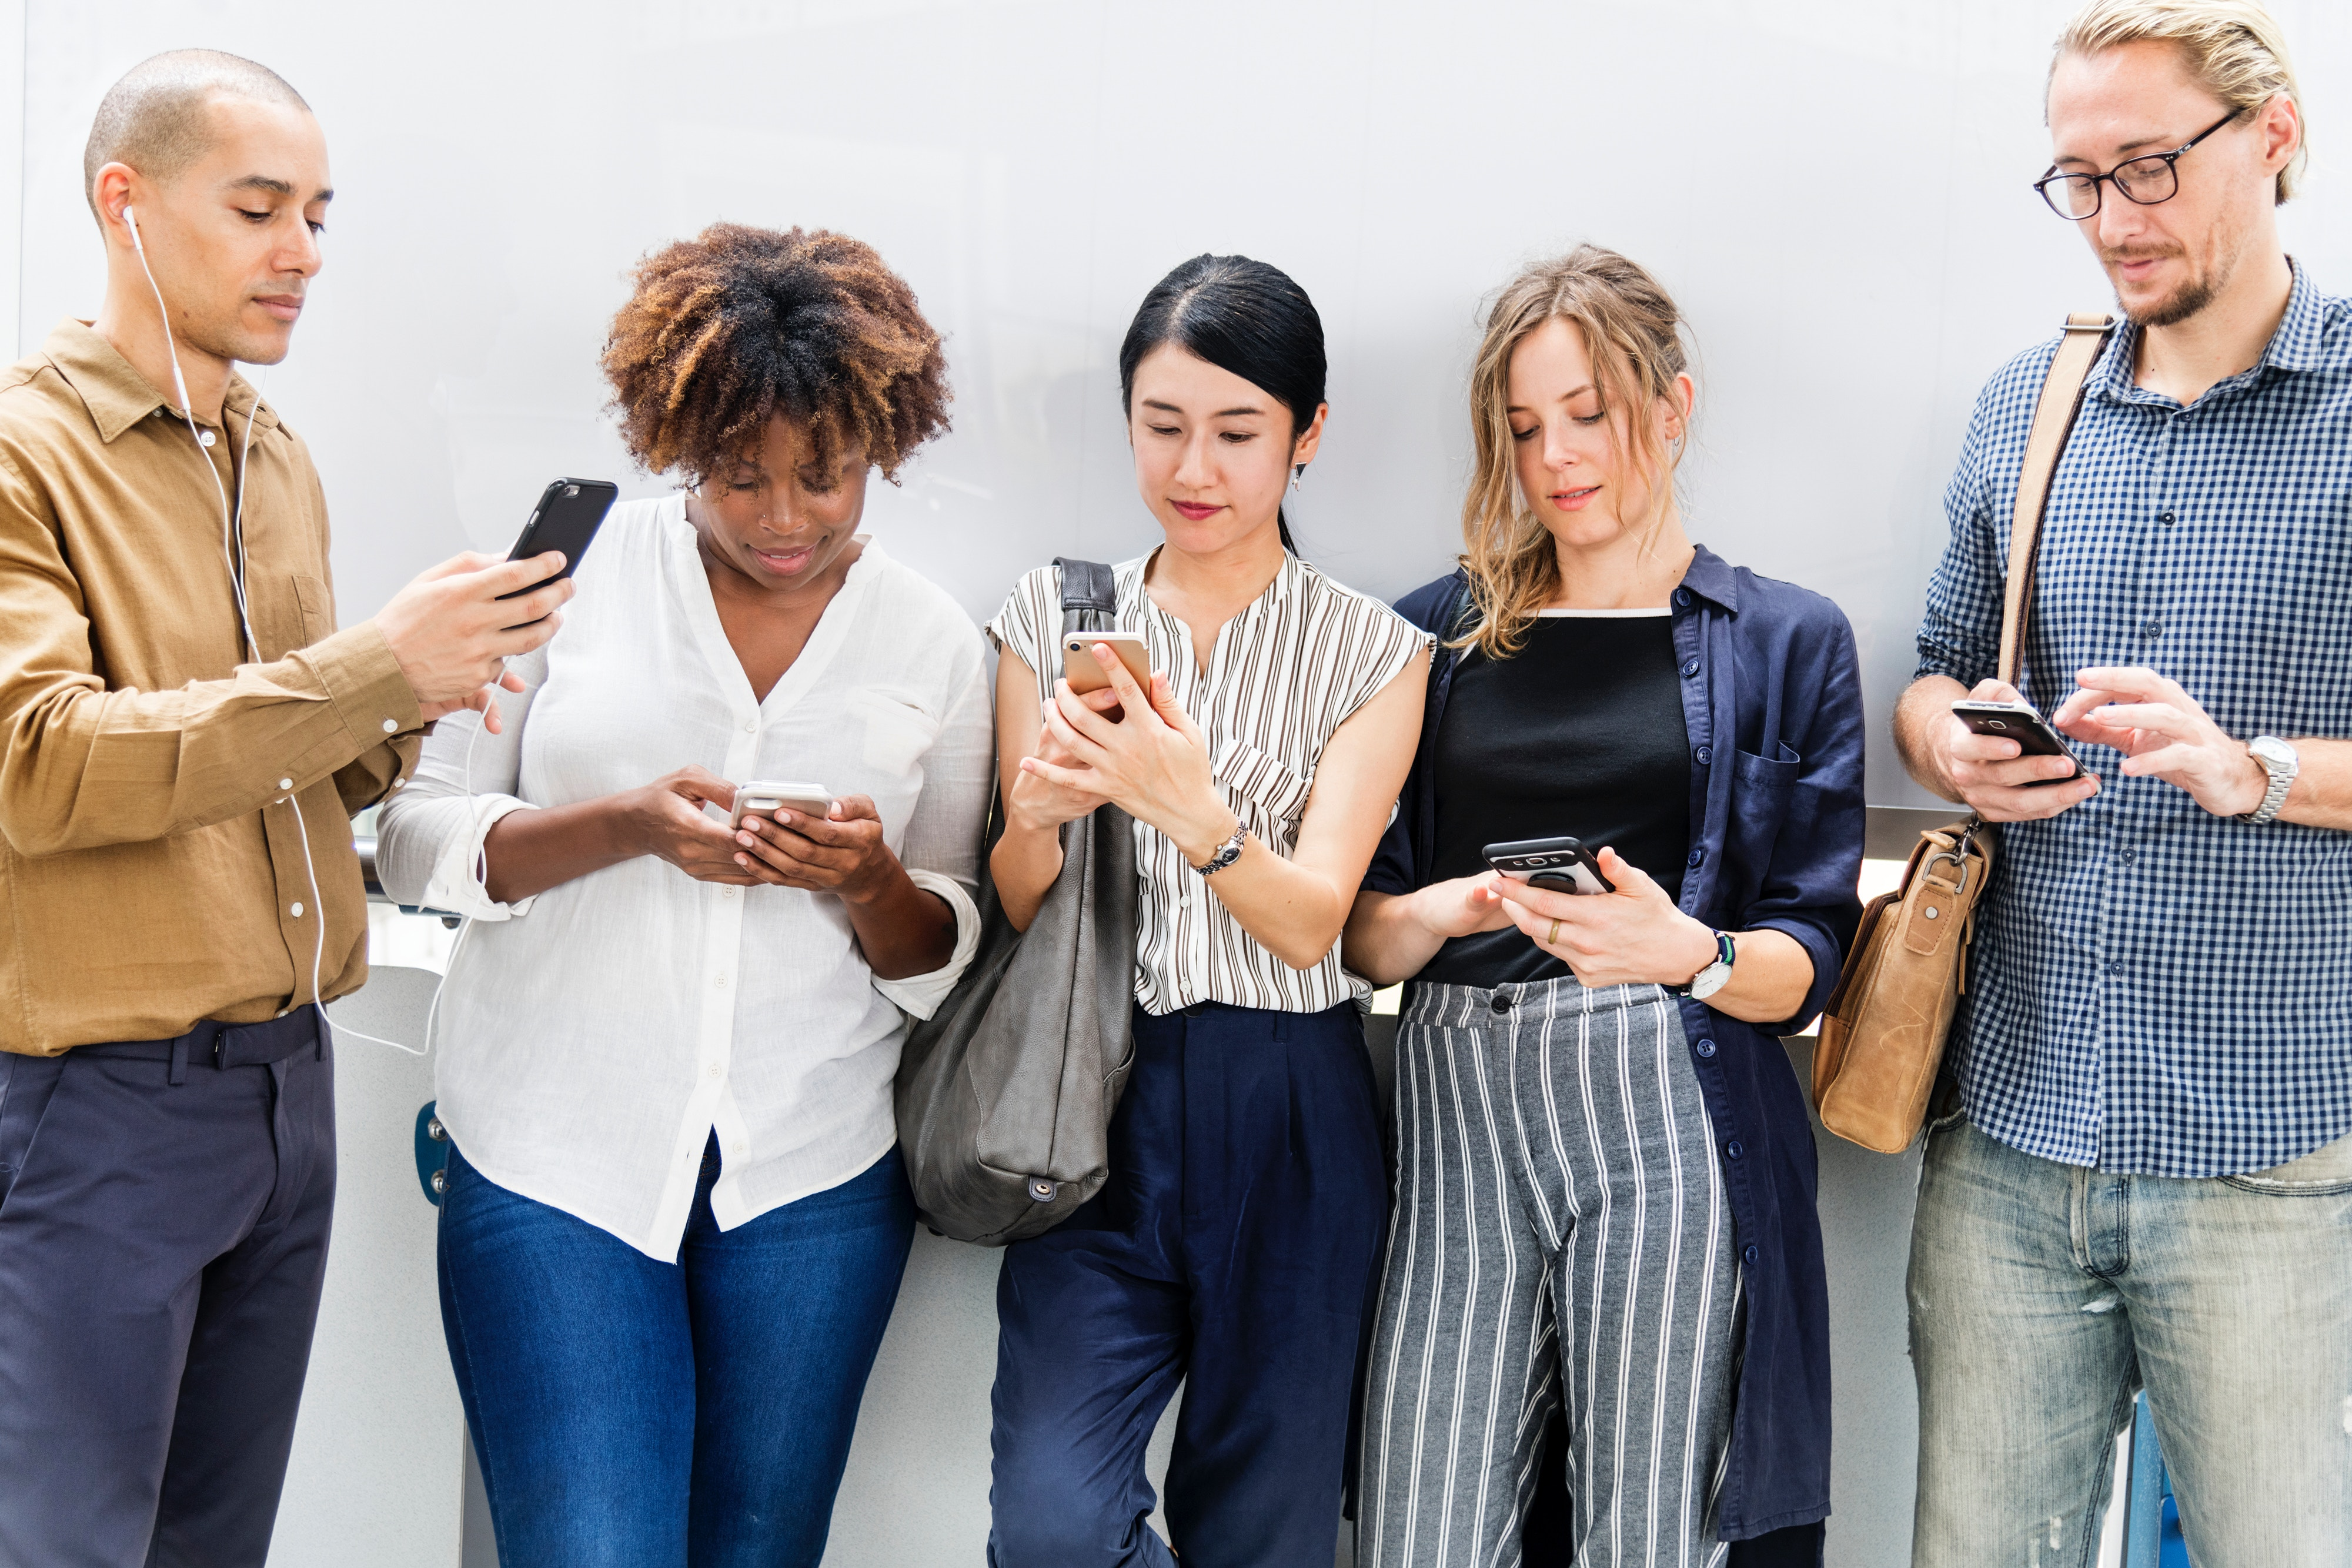 SHRM's New Guidelines on Social Media Screening